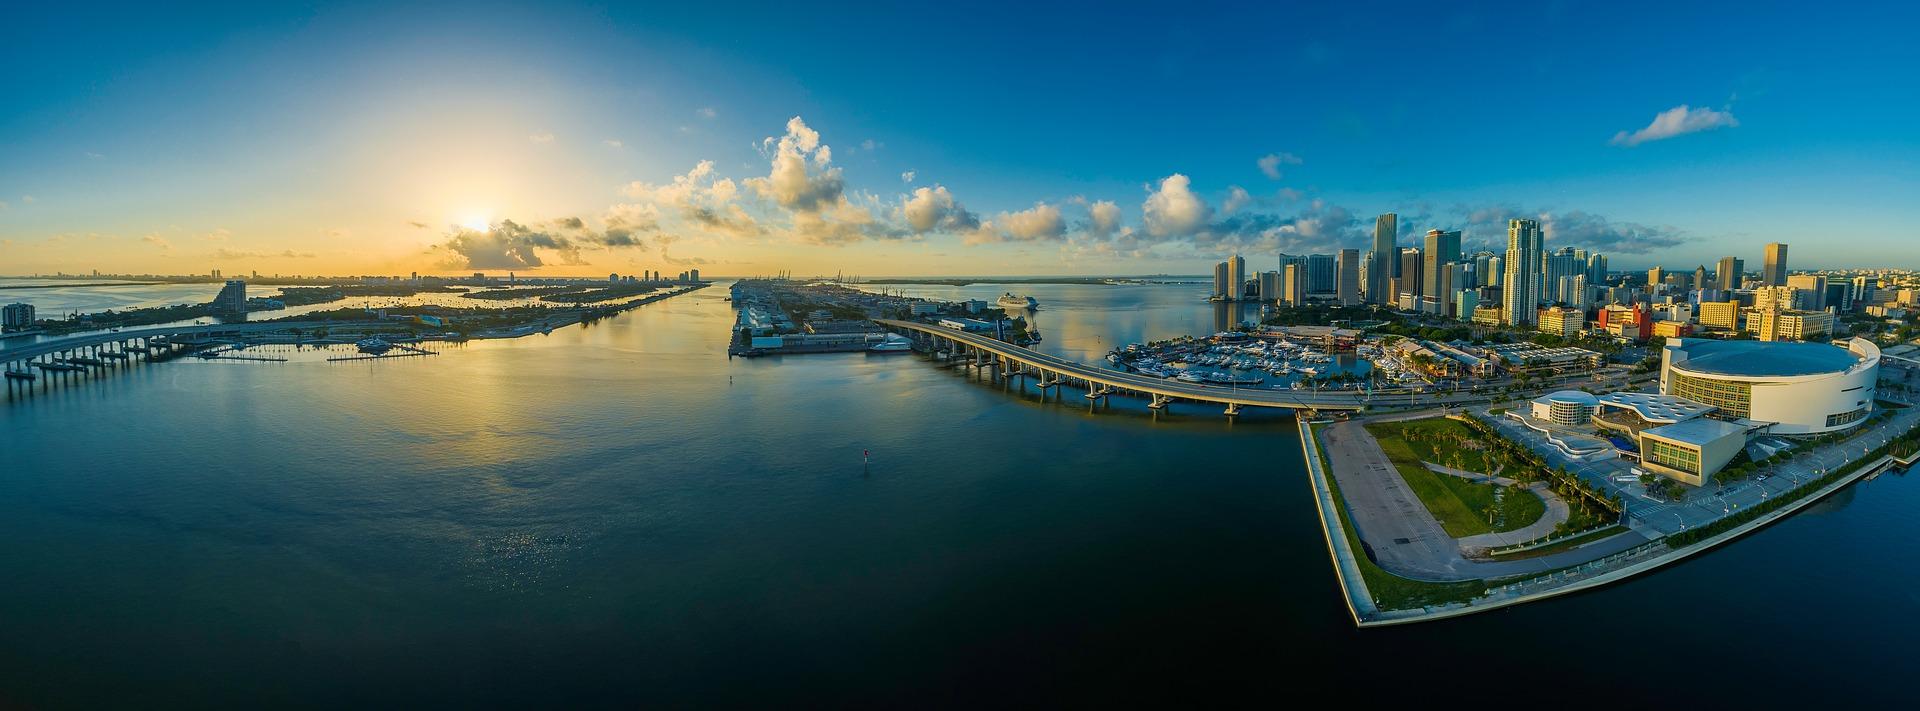 aansluiting app Miami